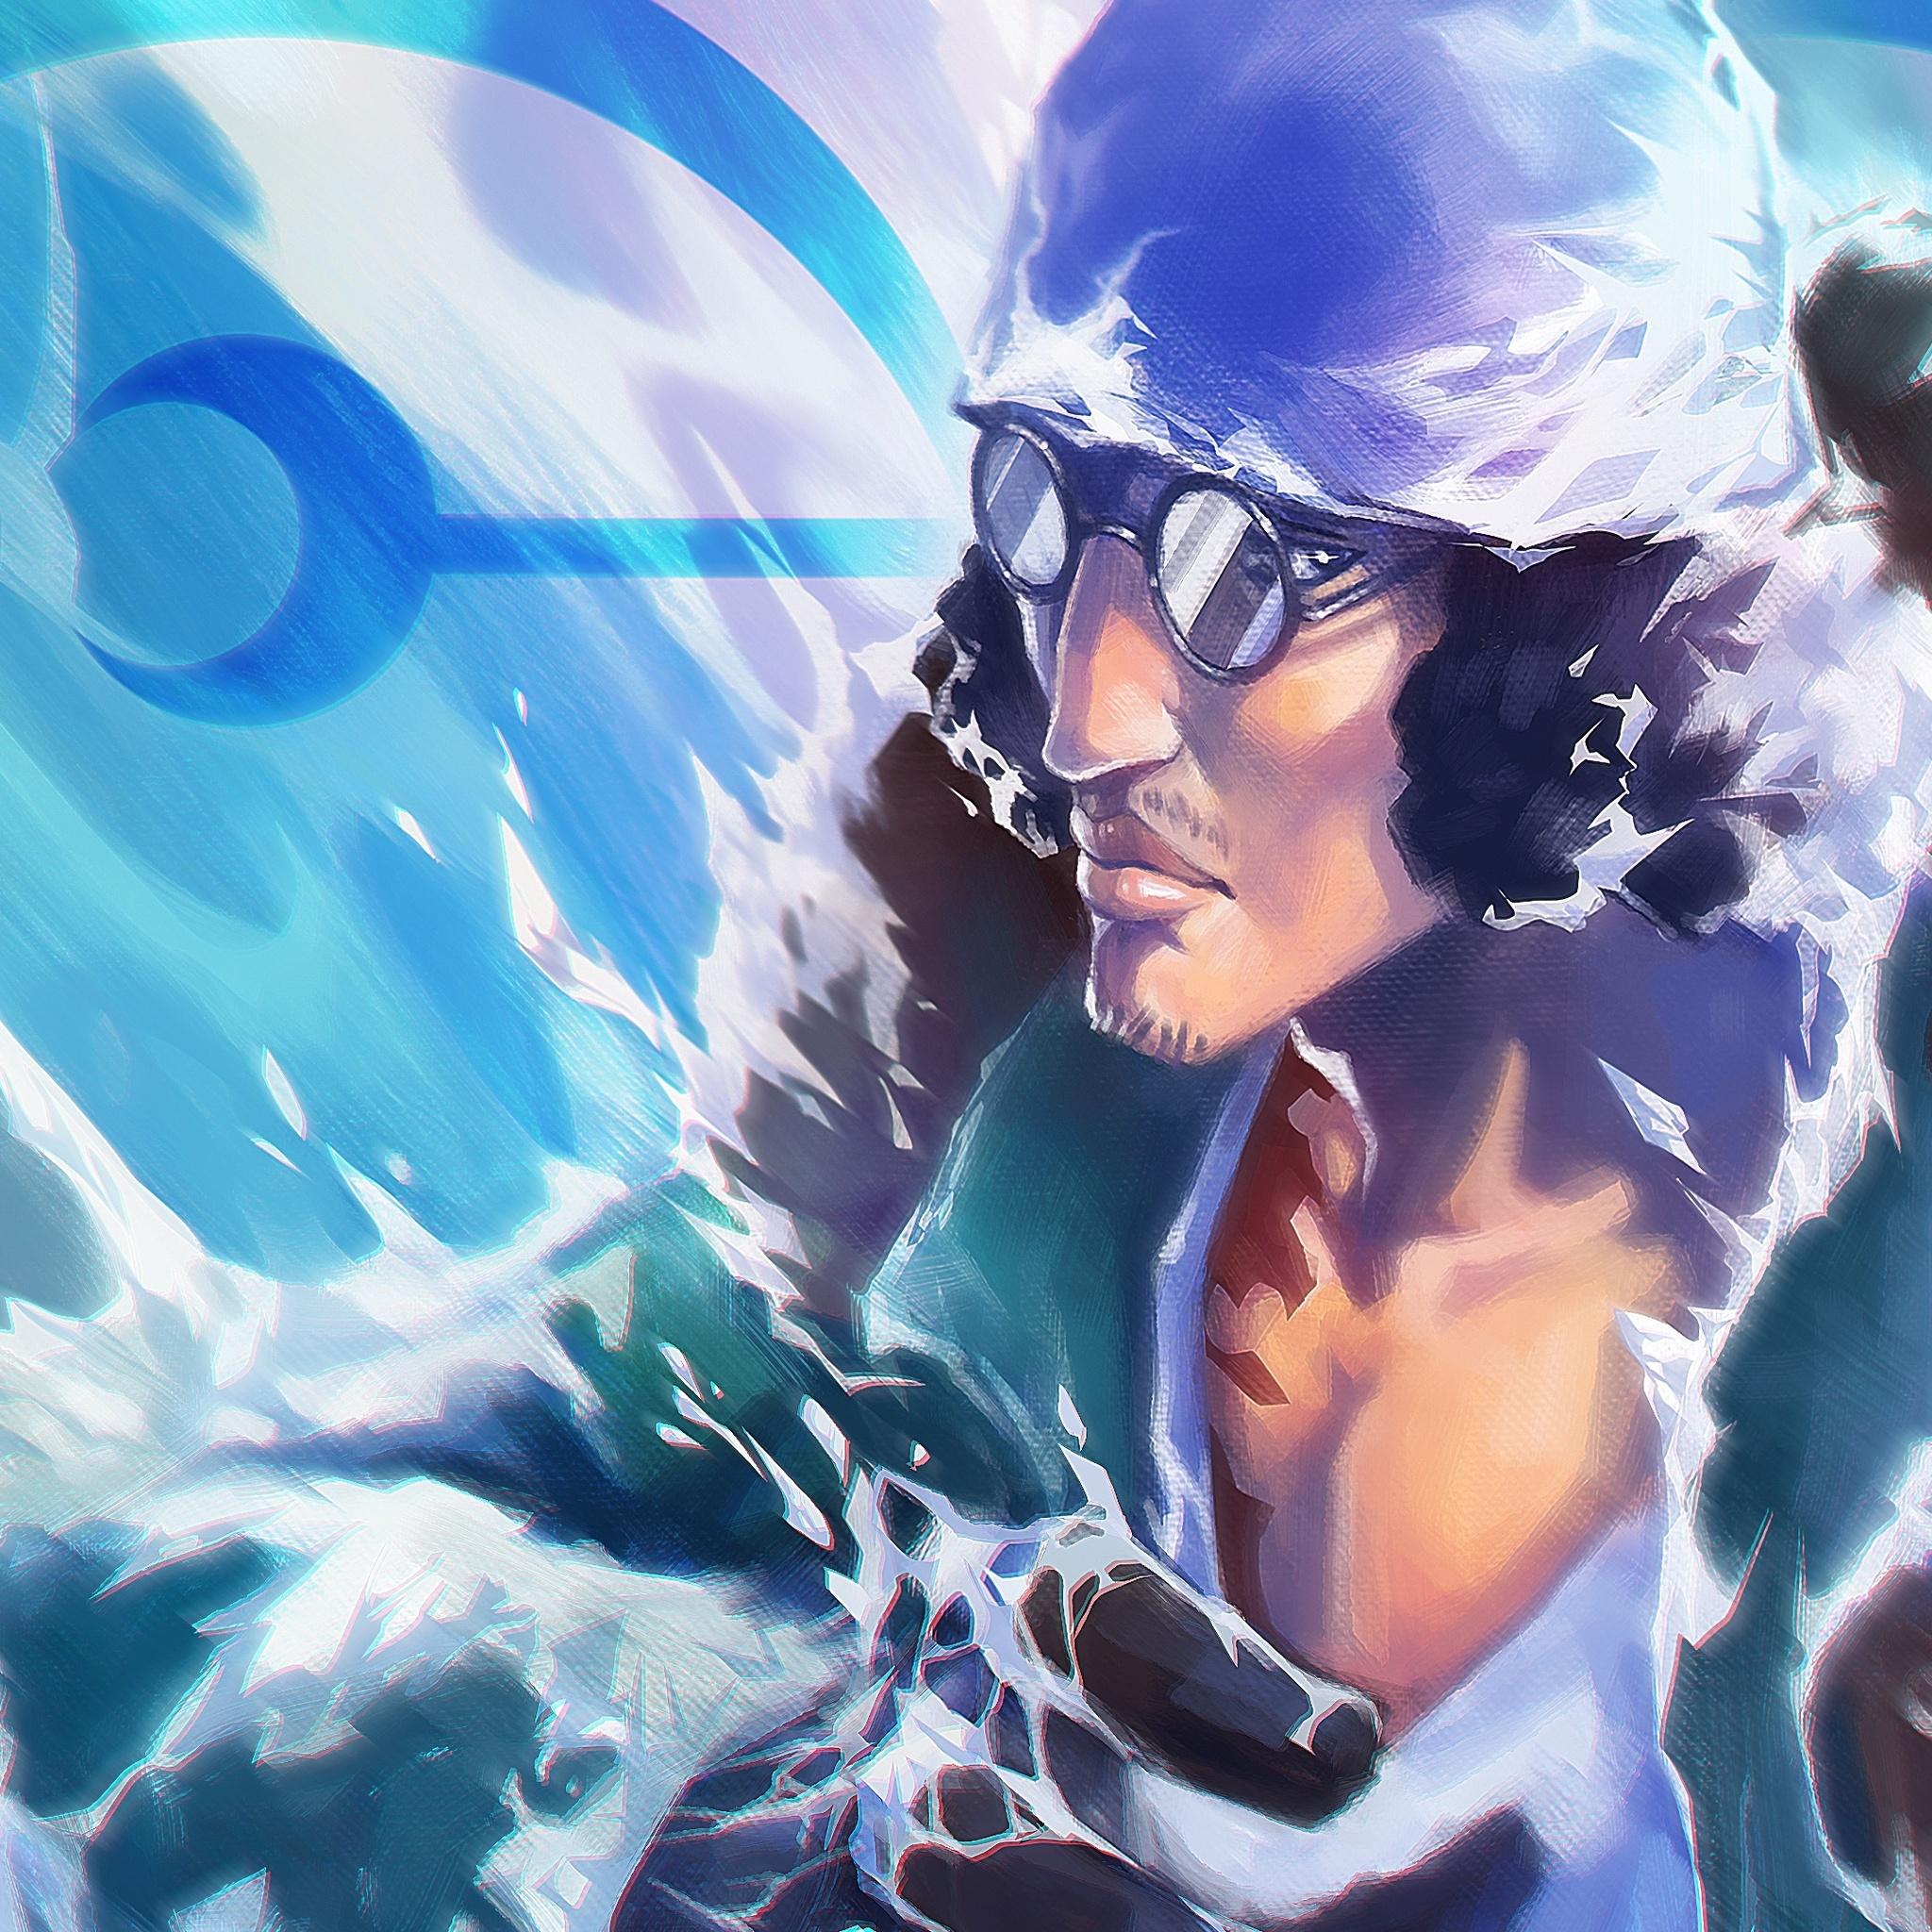 2048x2048 Kuzan One Piece Anime 4k Ipad Air HD 4k ...